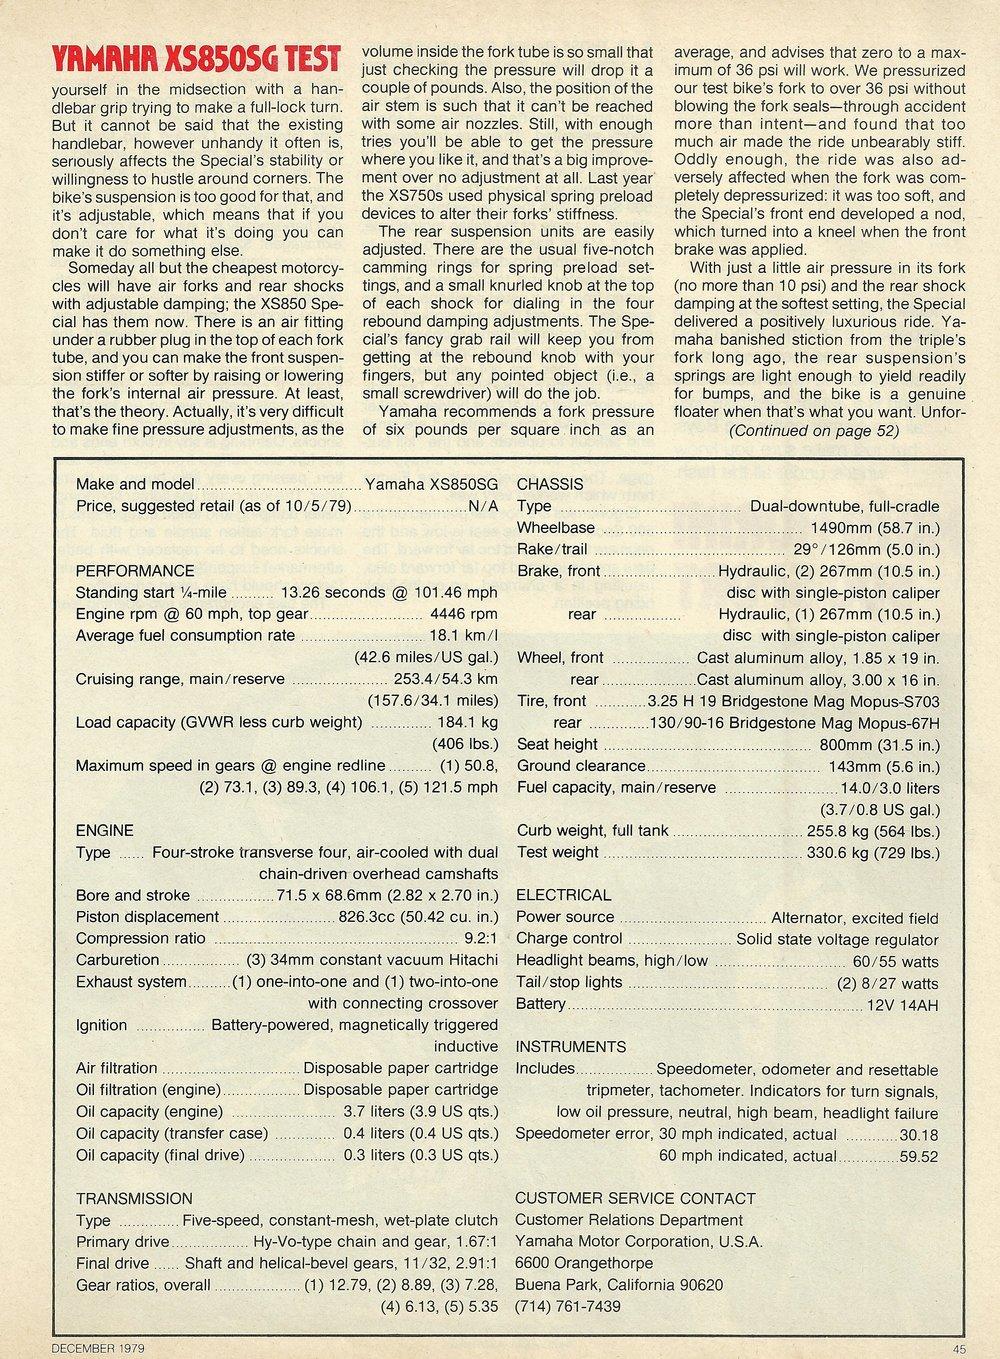 1980 Yamaha XS850SG road test 7.JPG